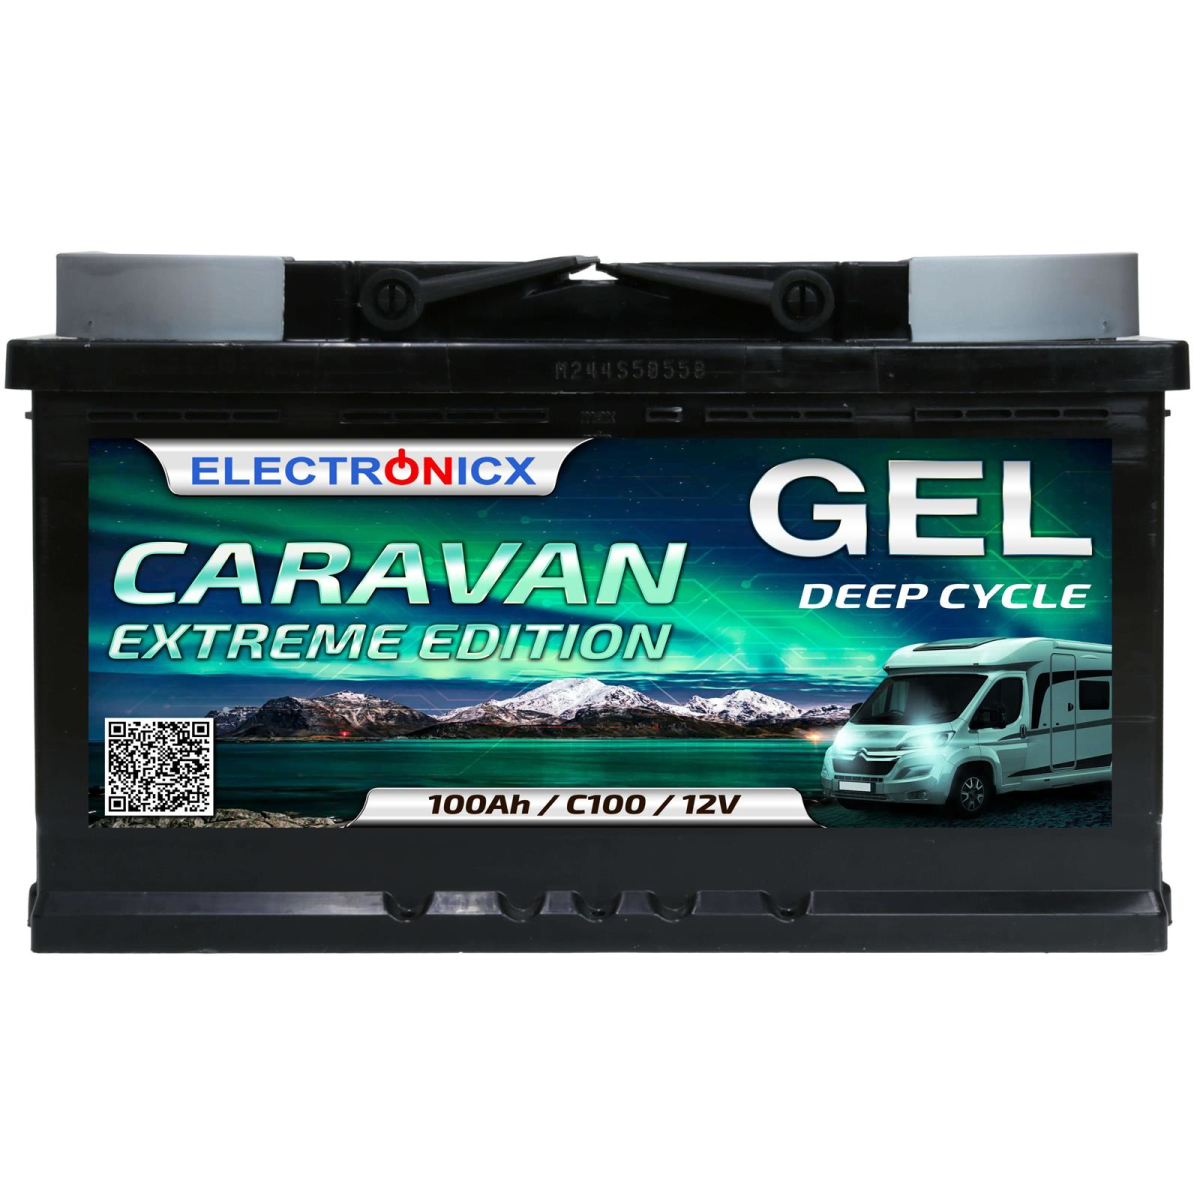 Electronicx Caravan EXTREME Edition GEL Batterie 100 AH 12V Wohnmobil Boot Versorgung